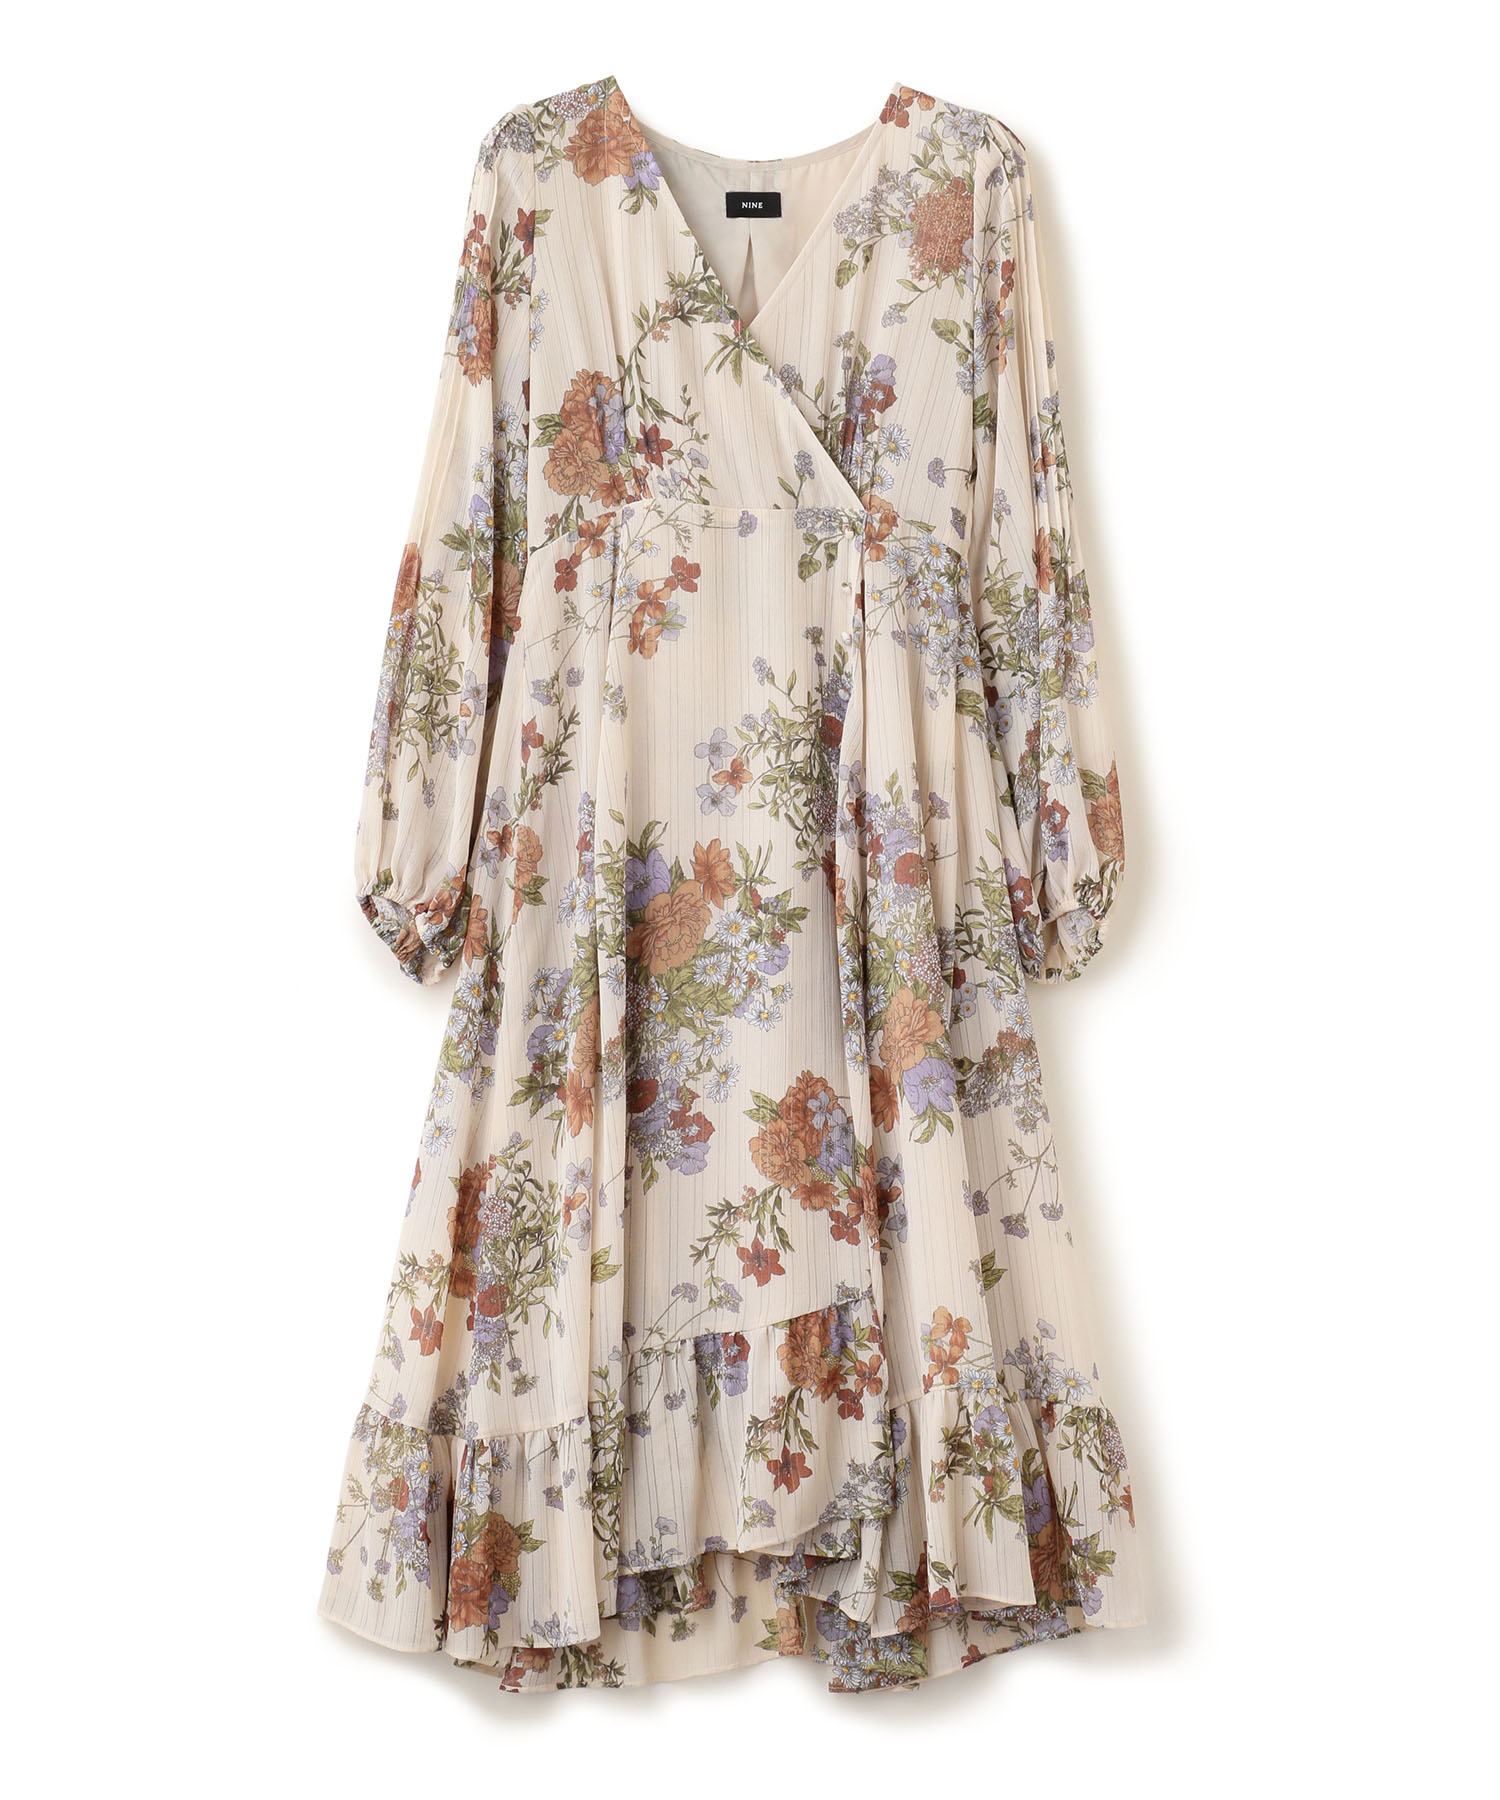 Stripe Flower Print Dress